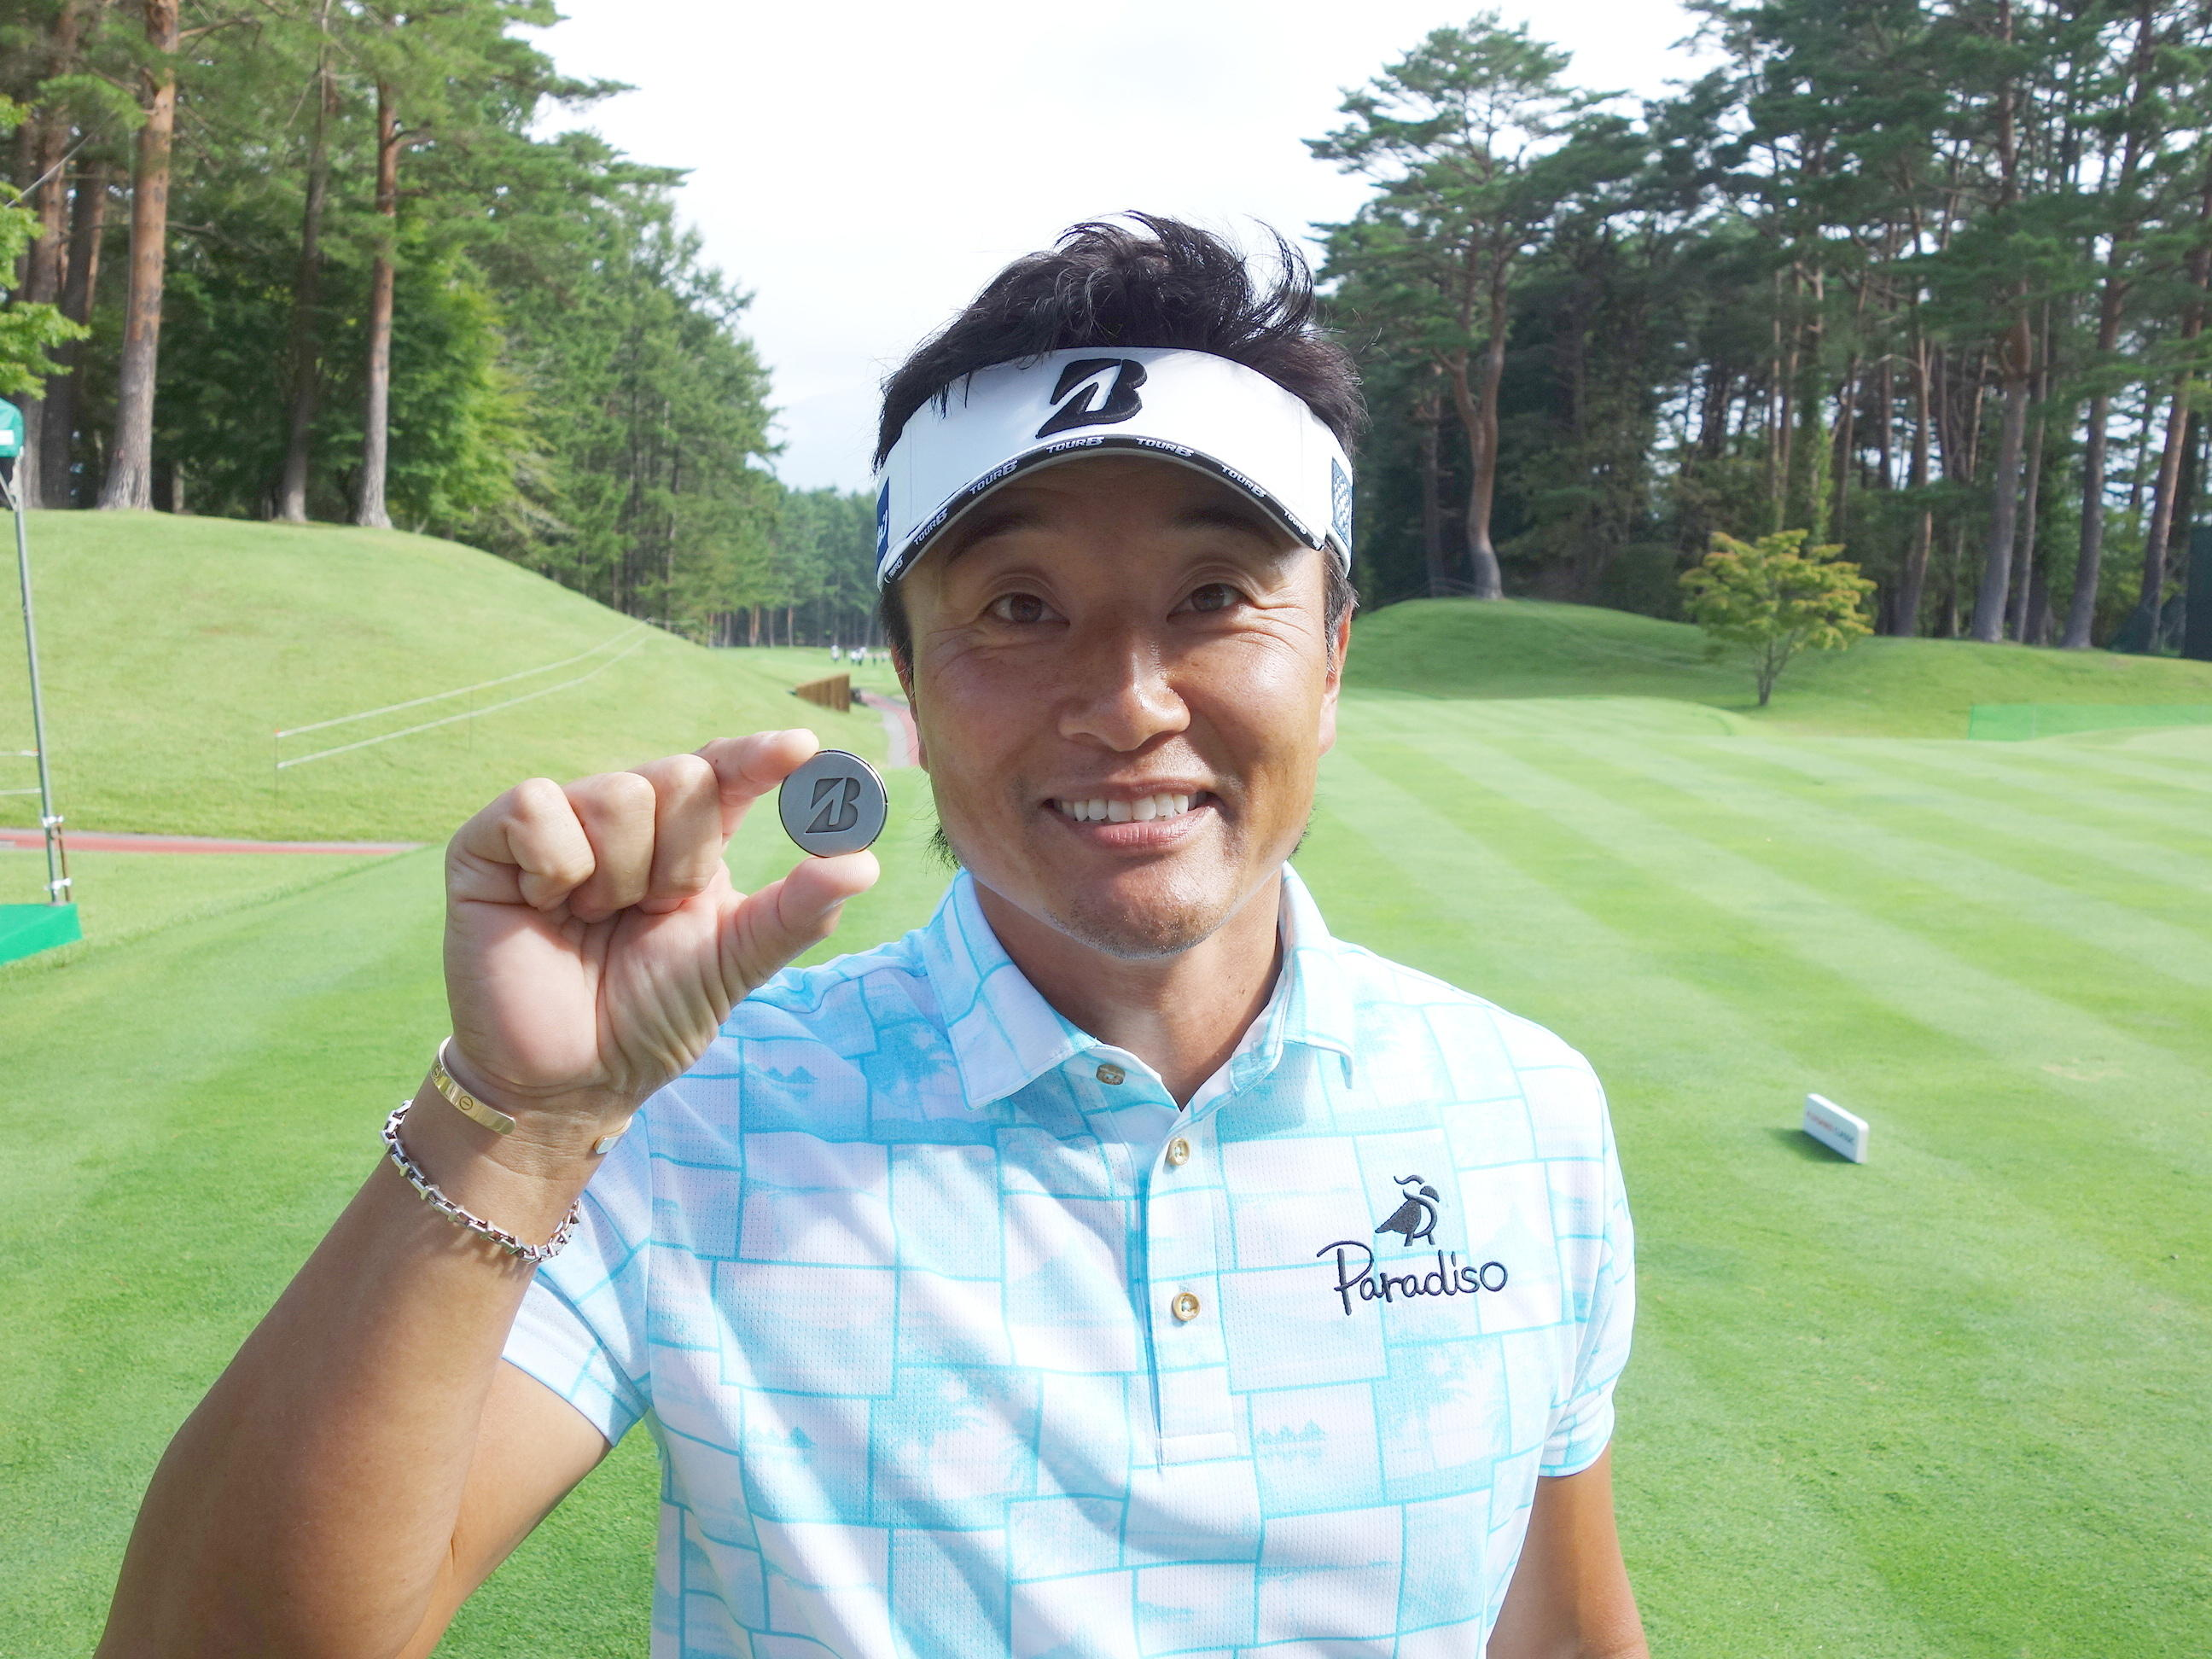 https://www.bs-golf.com/pro/4648318fcfd62b88a70a76821c17ee53ed494758.JPG